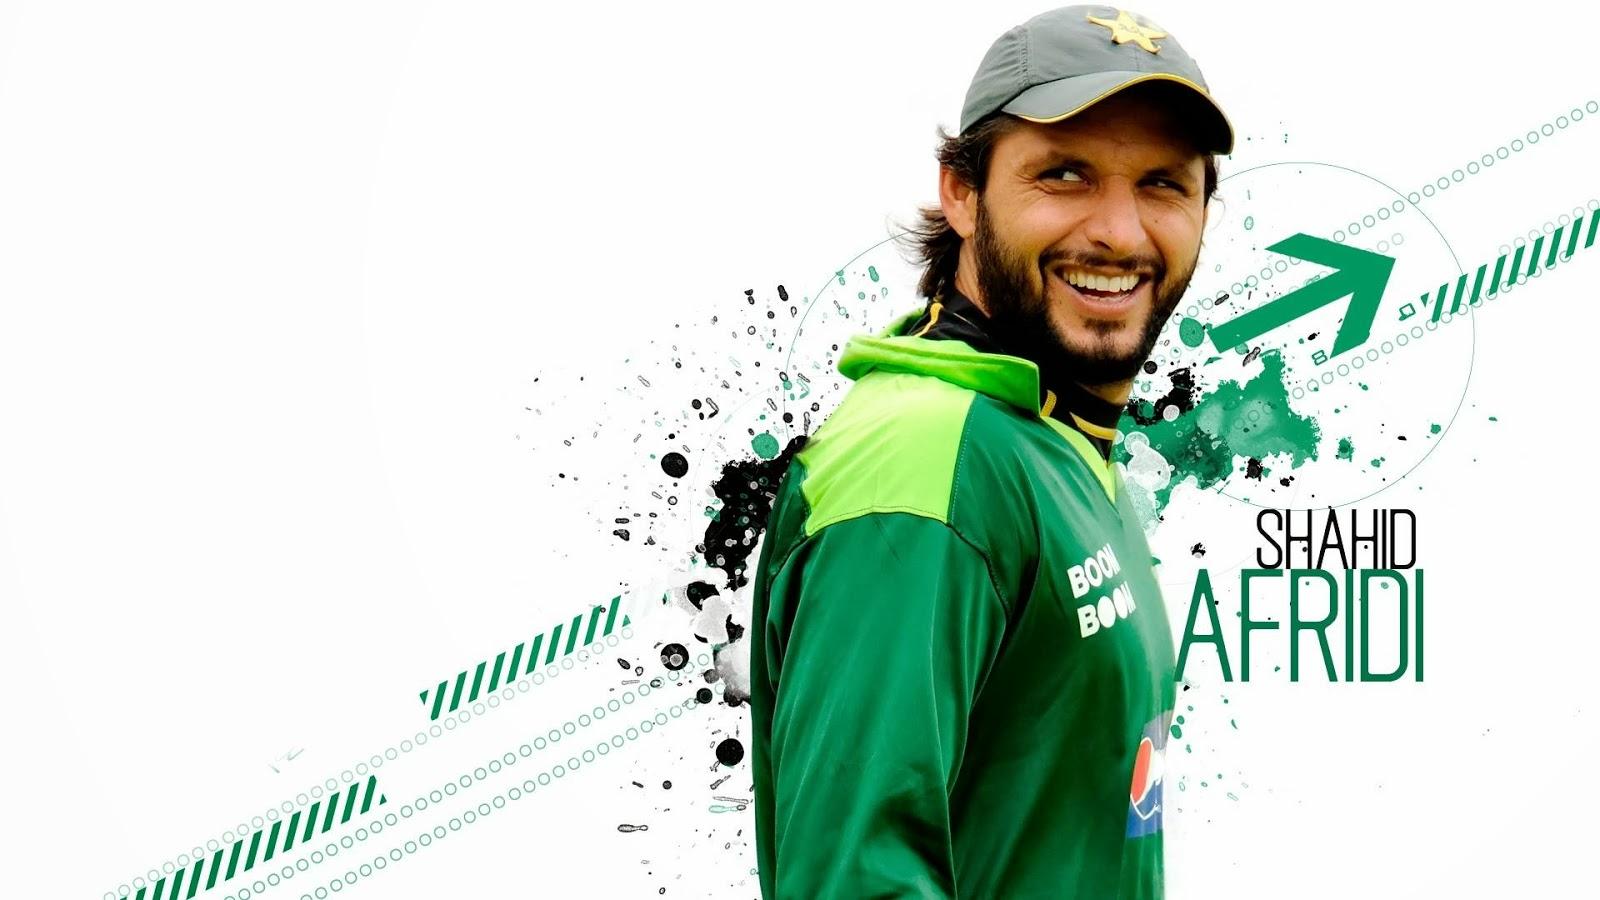 Sports Men Hub: Shahid Afridi Wallpapers In Pakistan's